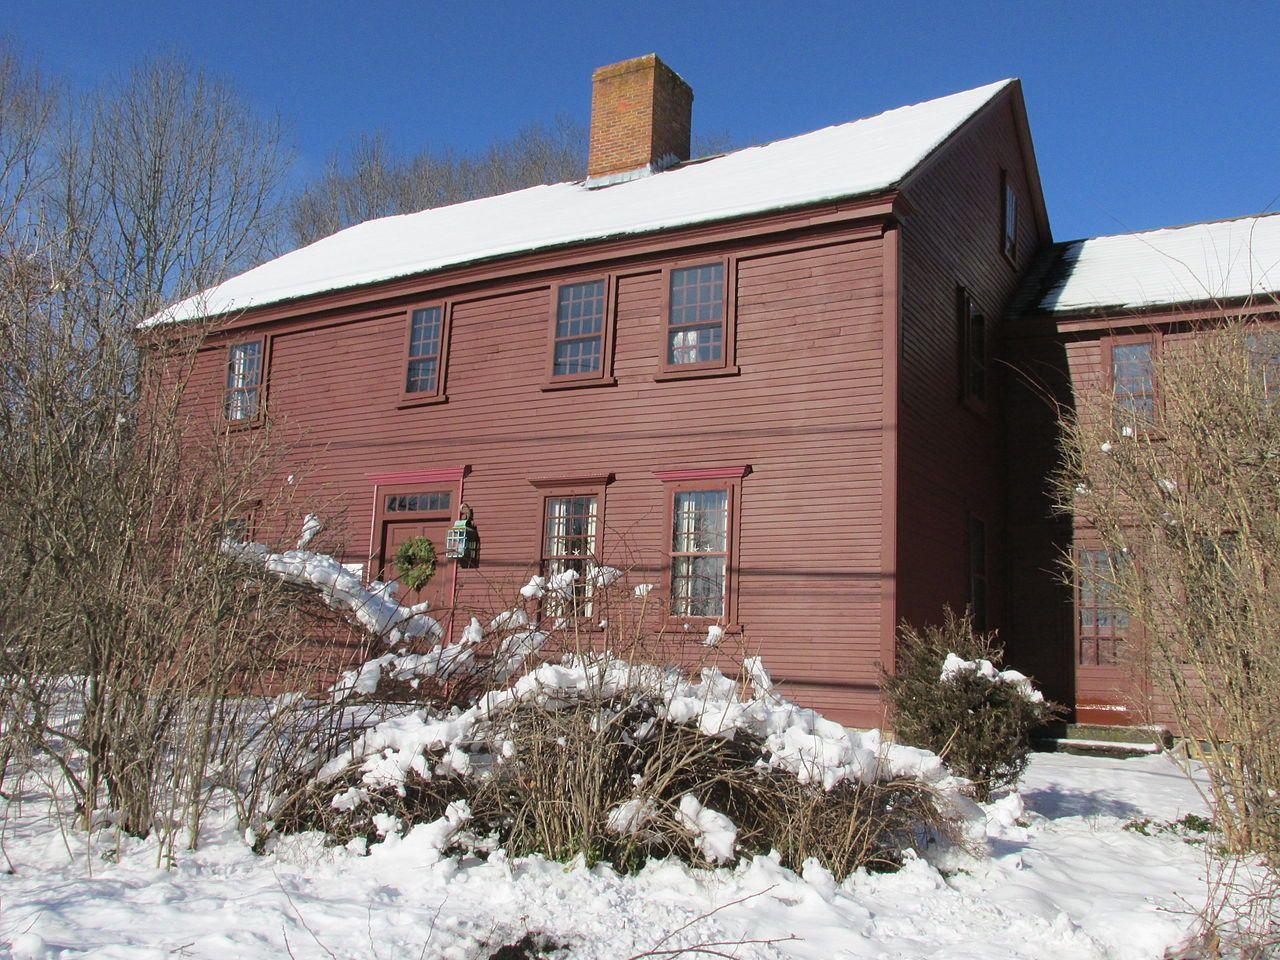 Daniel Bliss Homestead in Bristol County, Massachusetts